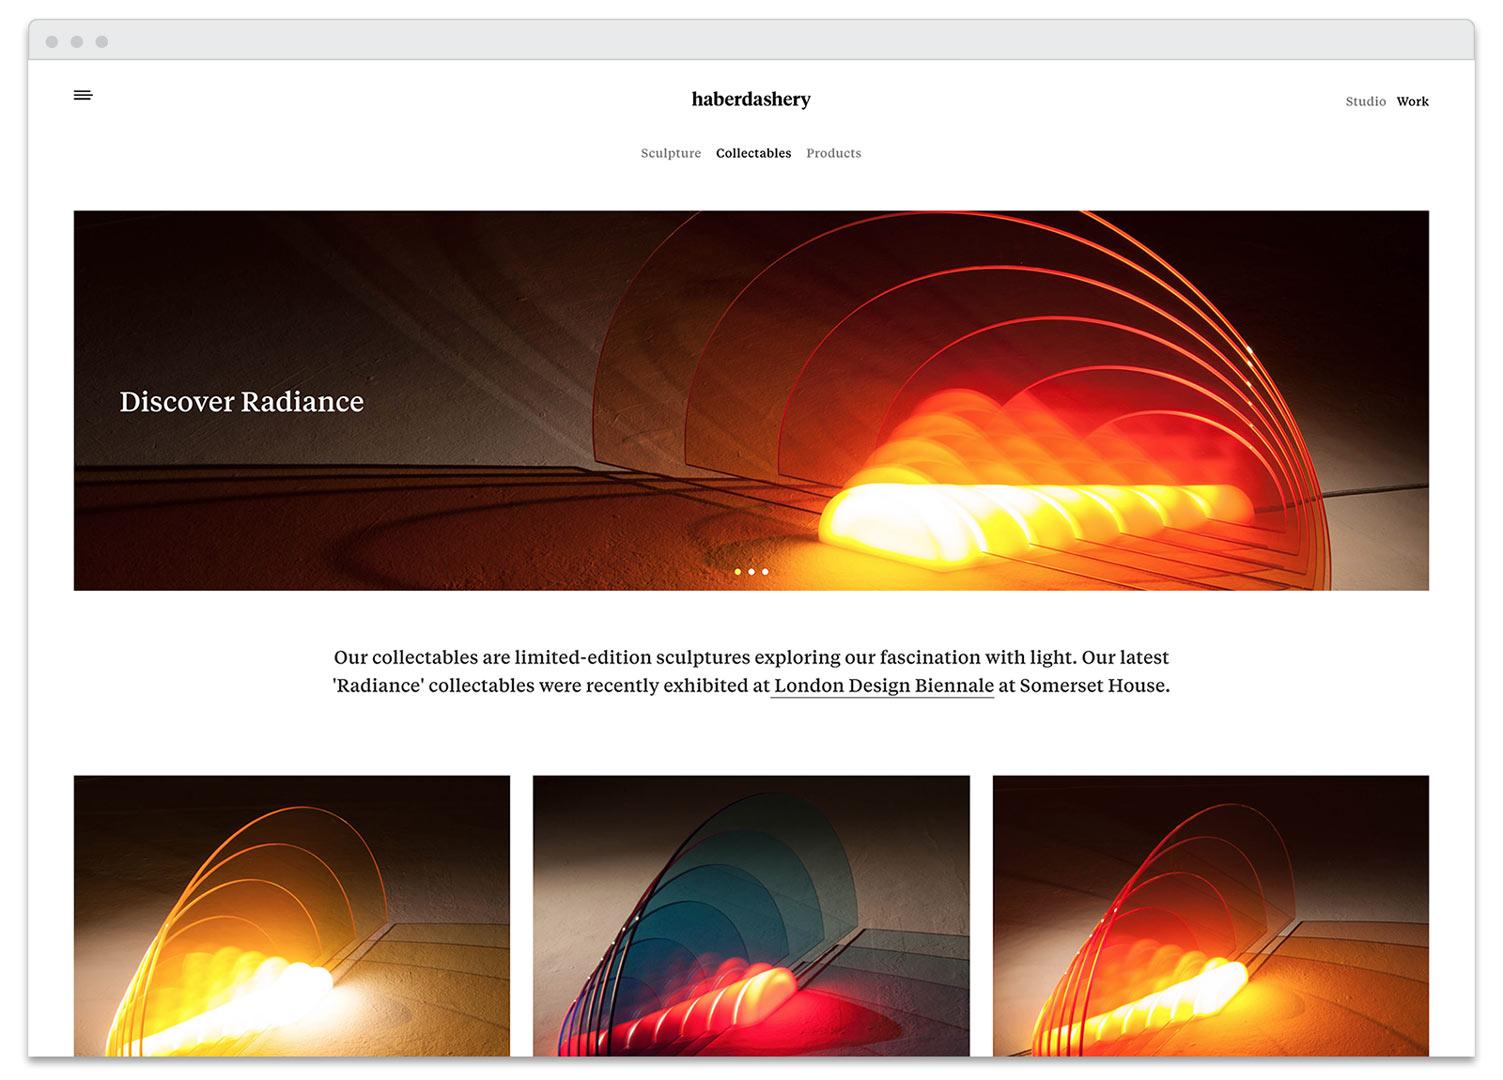 haberdashery_browser-view_03